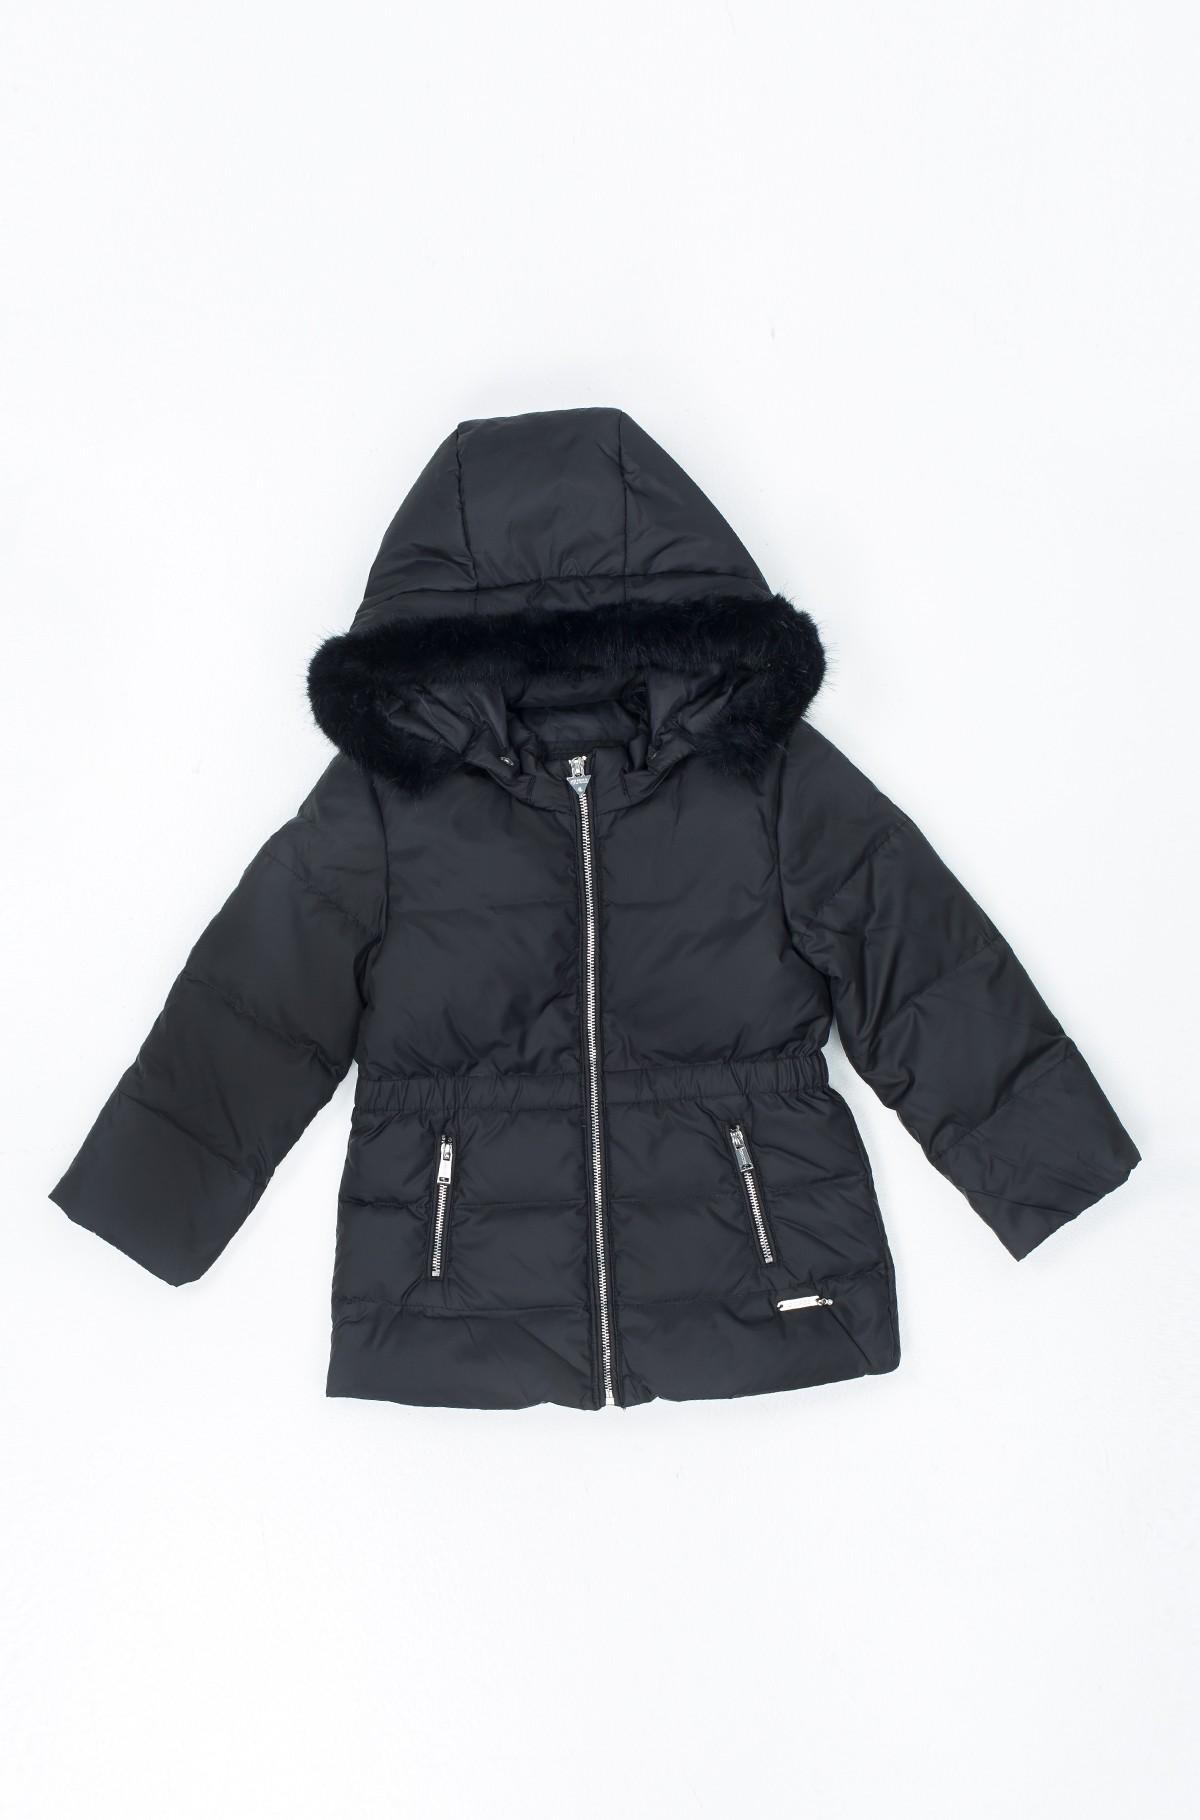 Kids jacket K84L07 W7S10-full-1